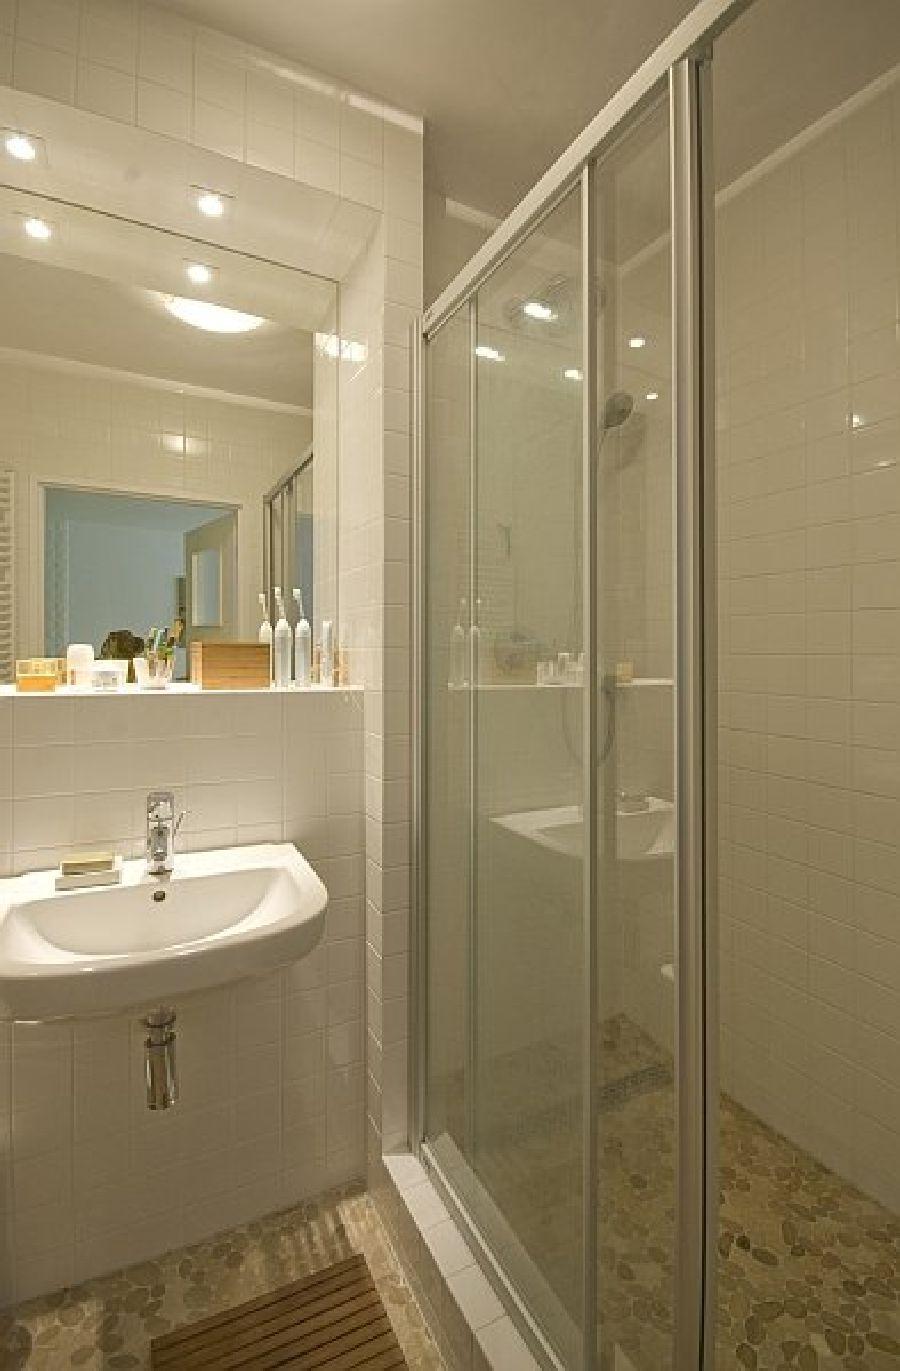 adelaparvu.com despre apartament 41 mp cu doua paturi matrimoniale, design interior arh Daria Pietryka (16)